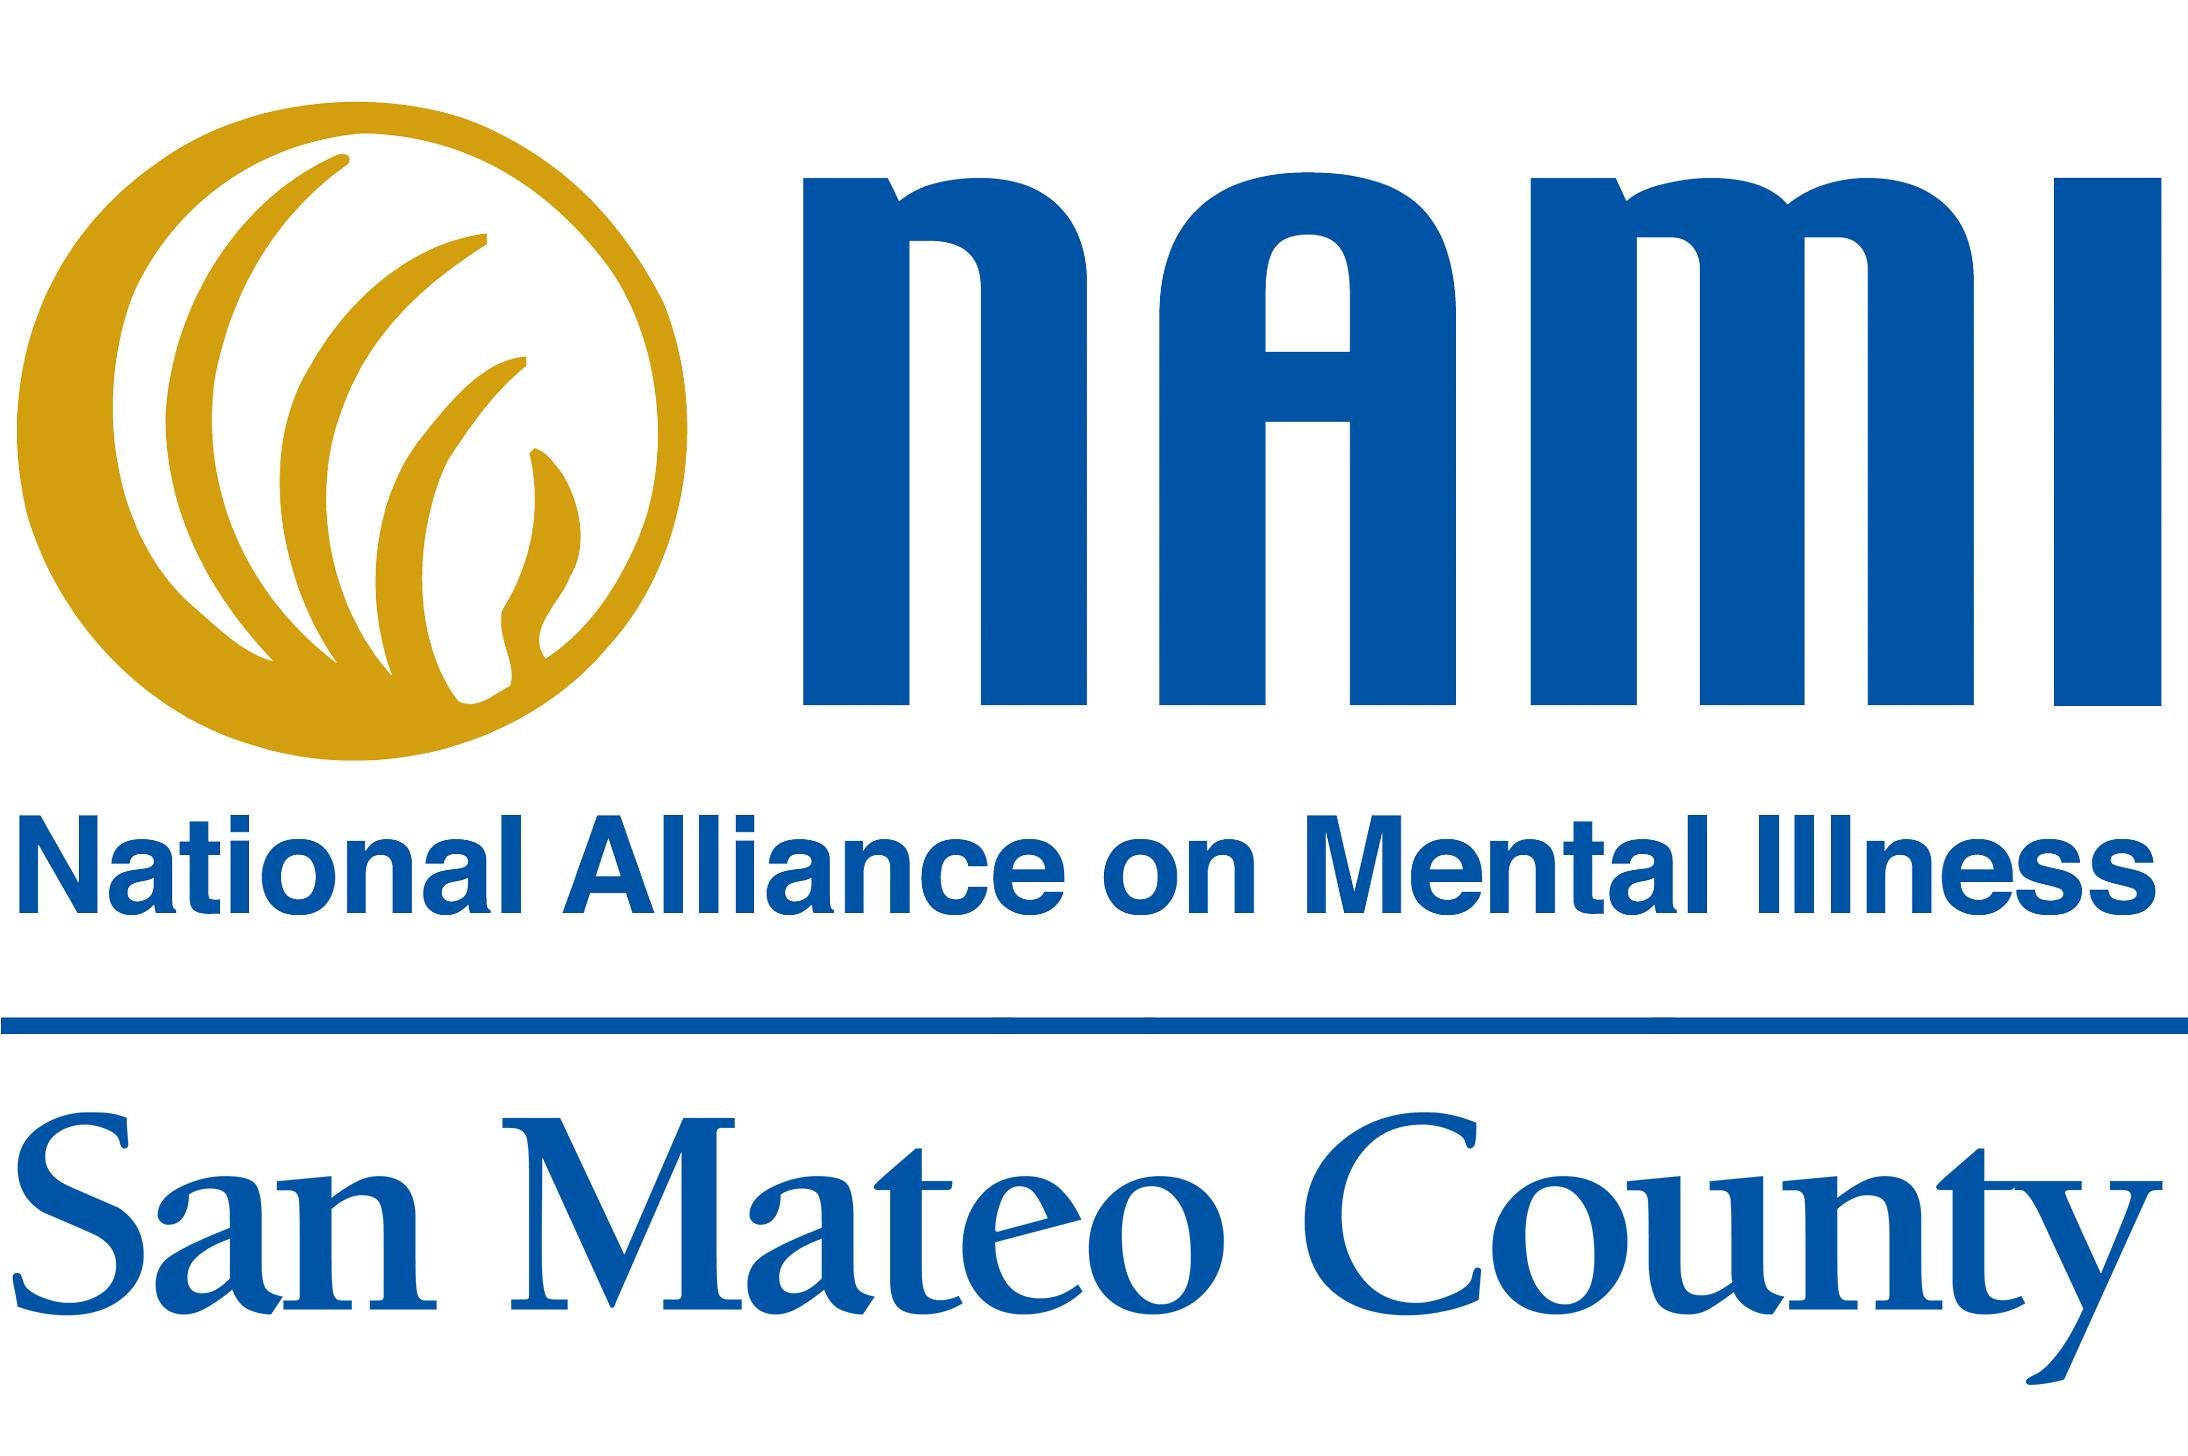 NAMI San Mateo County